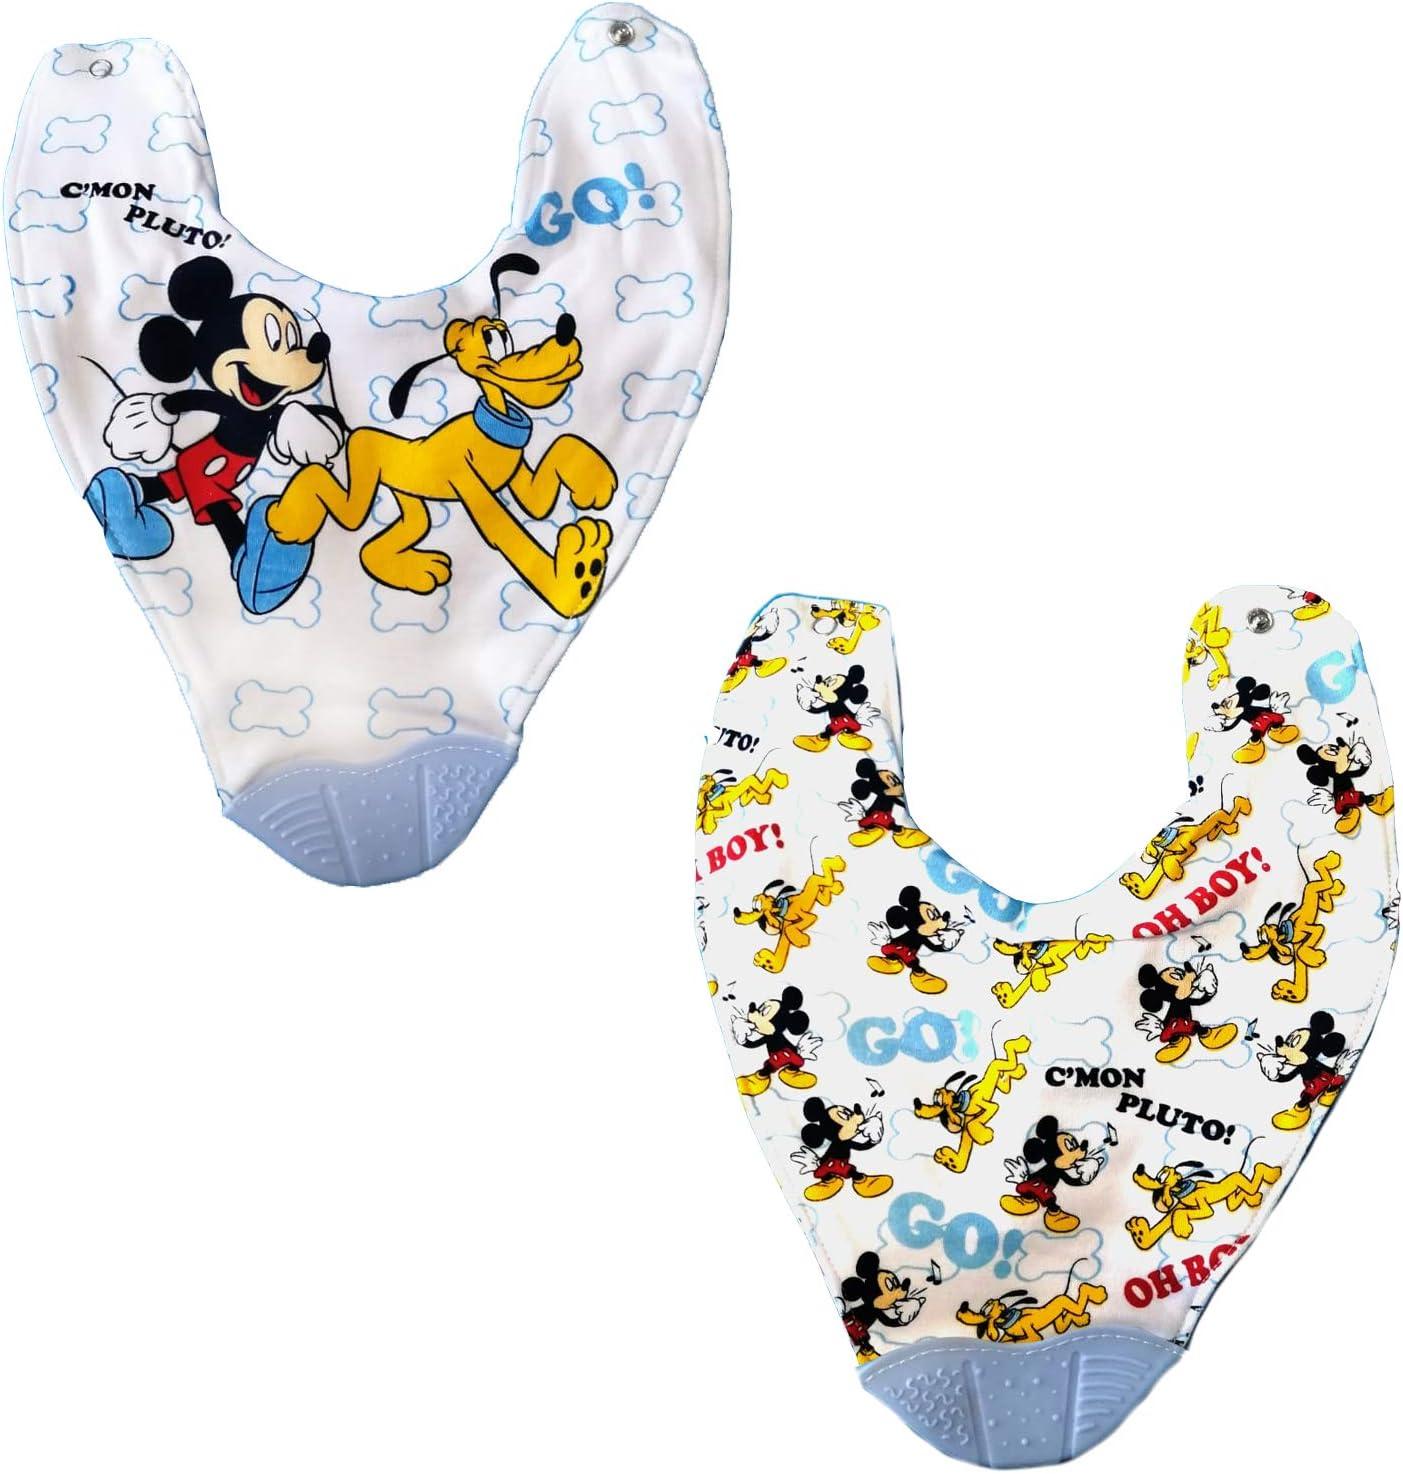 Set of 2 Bandana Bibs with Teething Accessory Minnie and Mickey Disney Mickey 9610